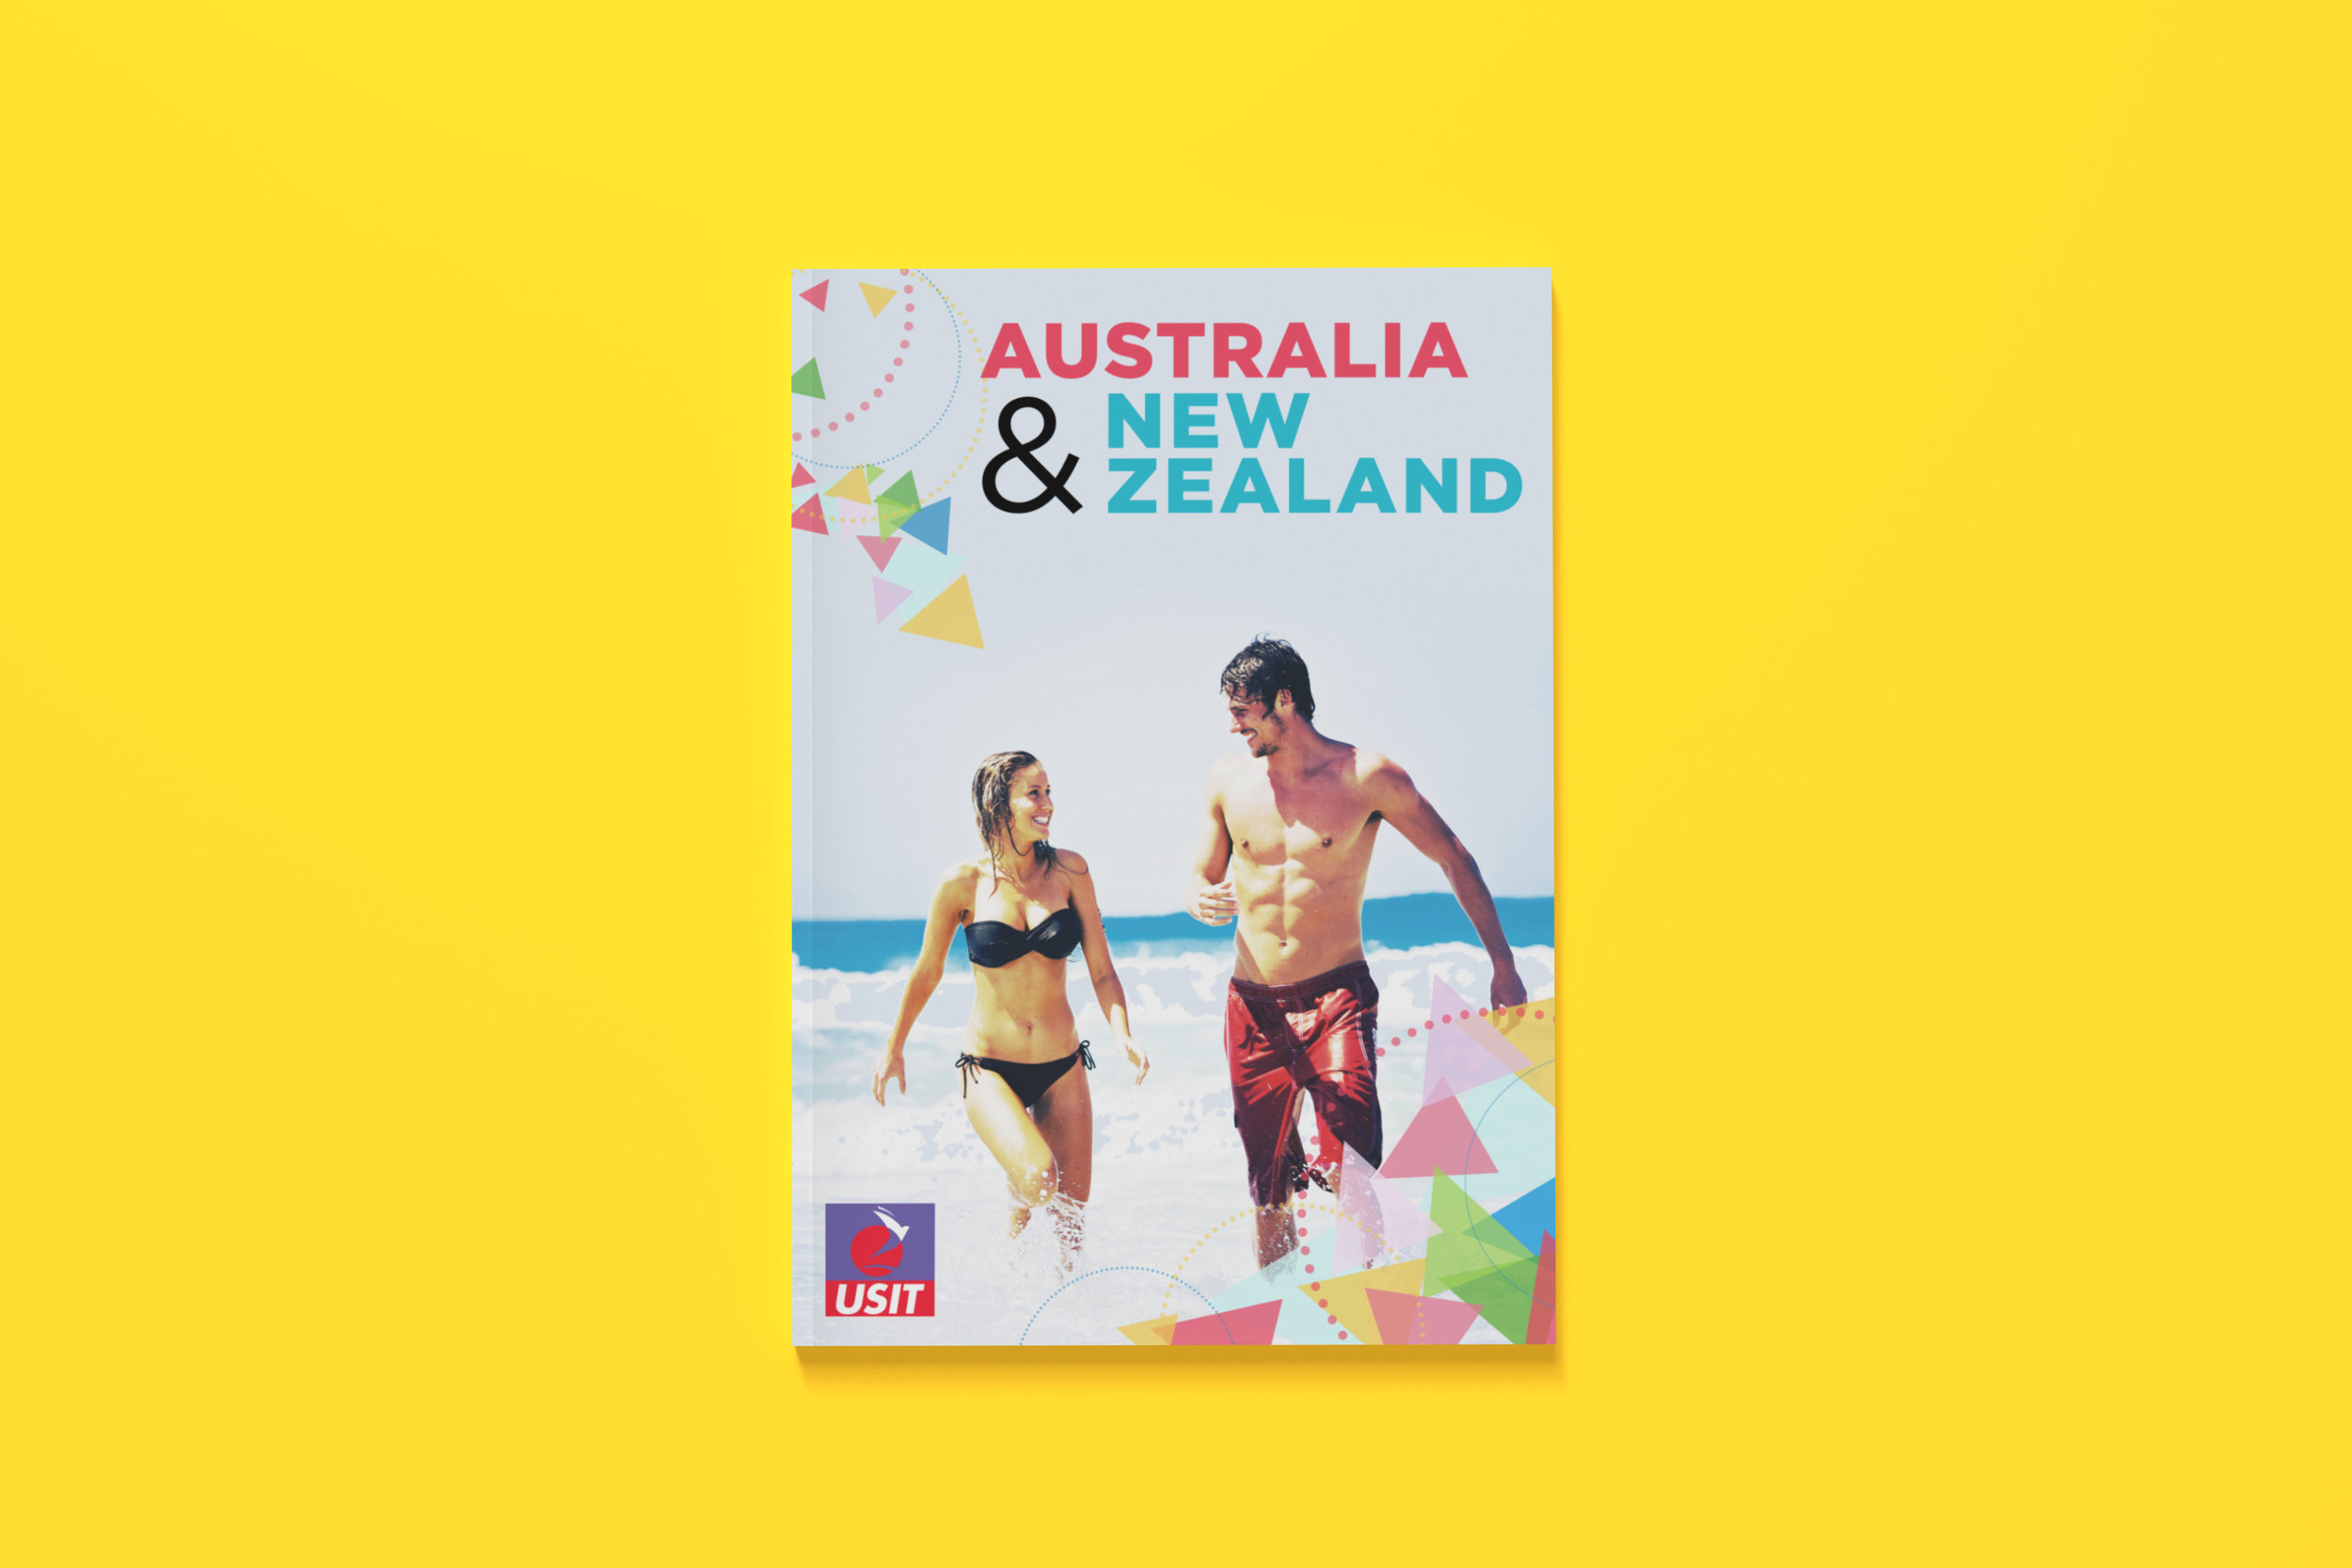 oz-brochure-cover.jpg